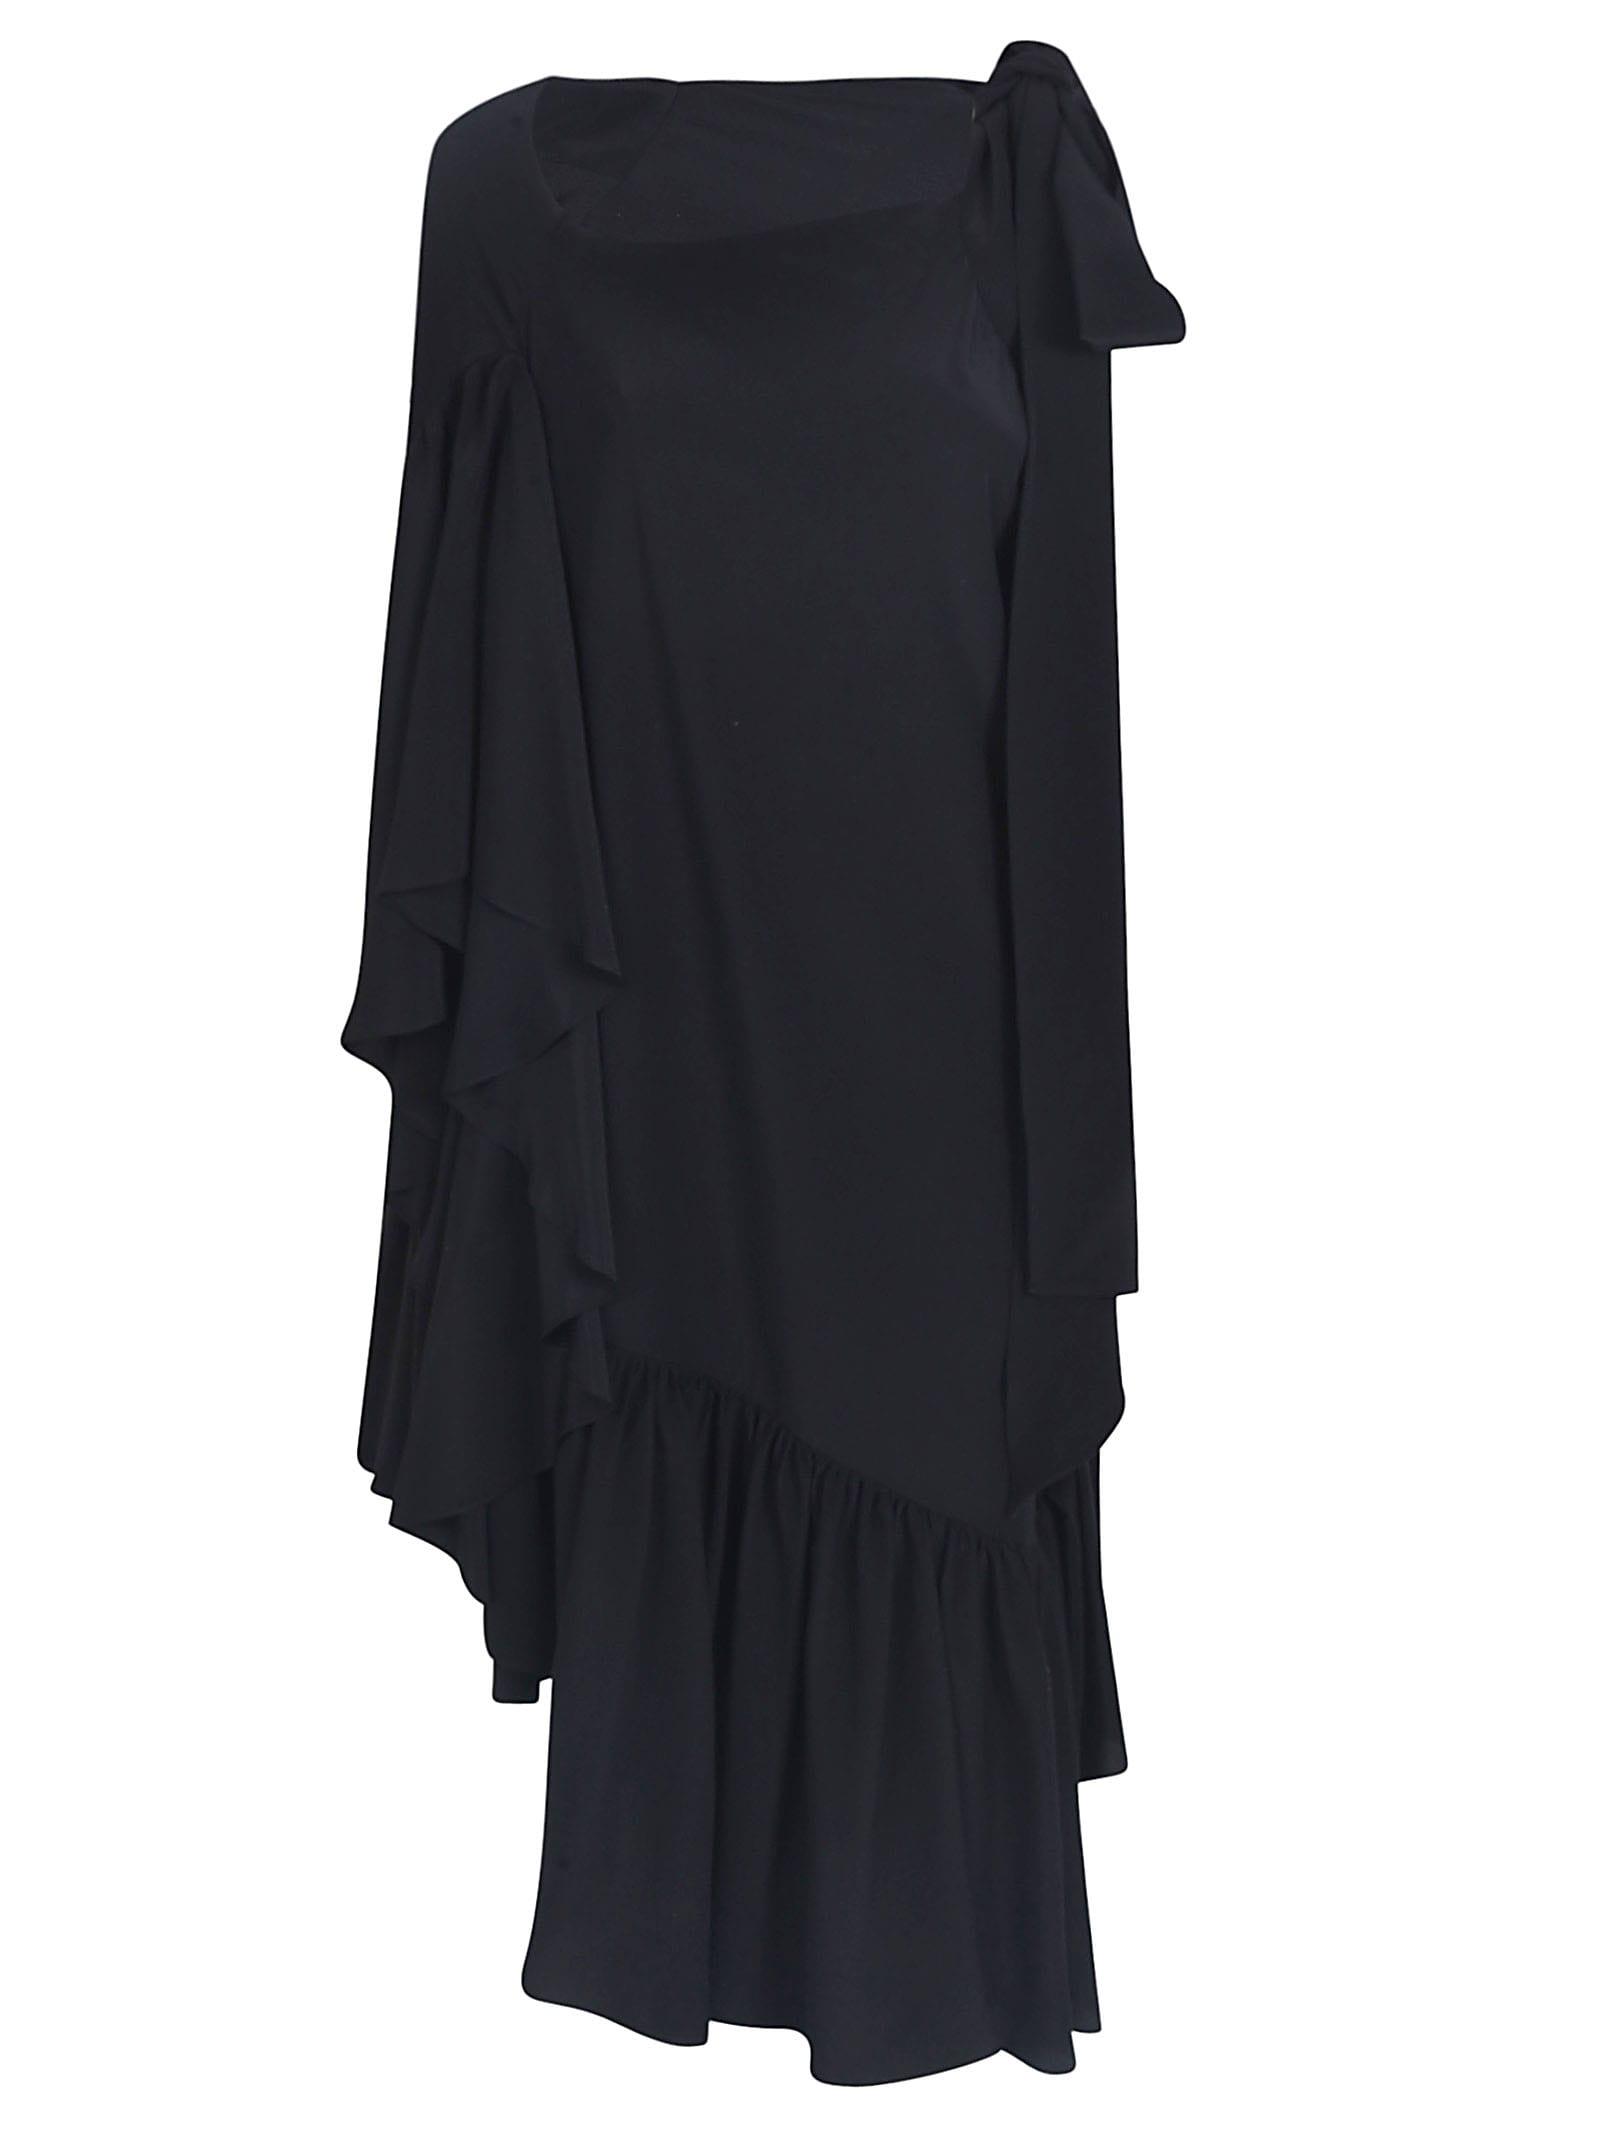 Buy Rochas Asymmetric Ruffled Dress online, shop Rochas with free shipping